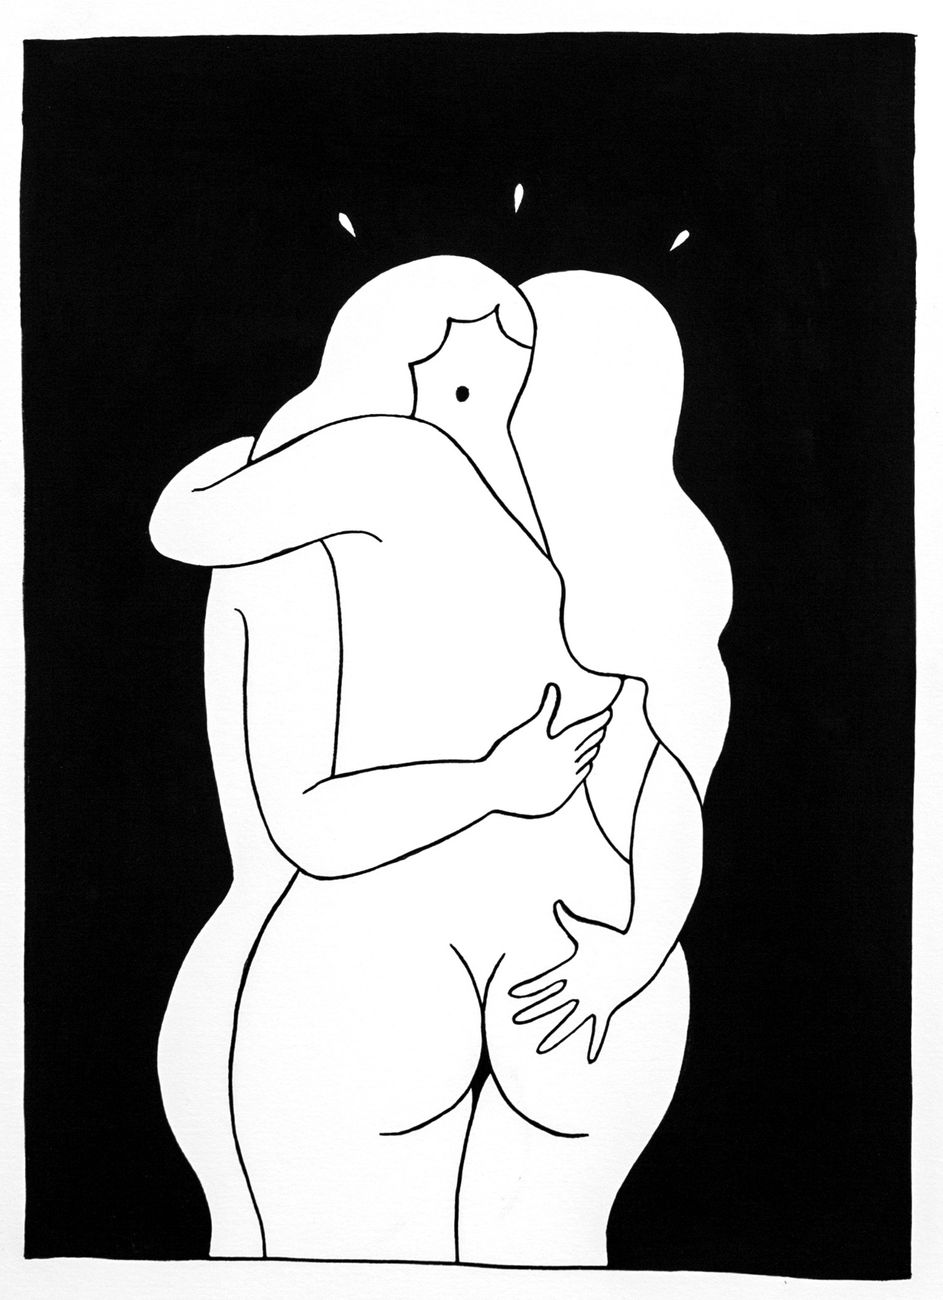 Parra, The Hug, 2013